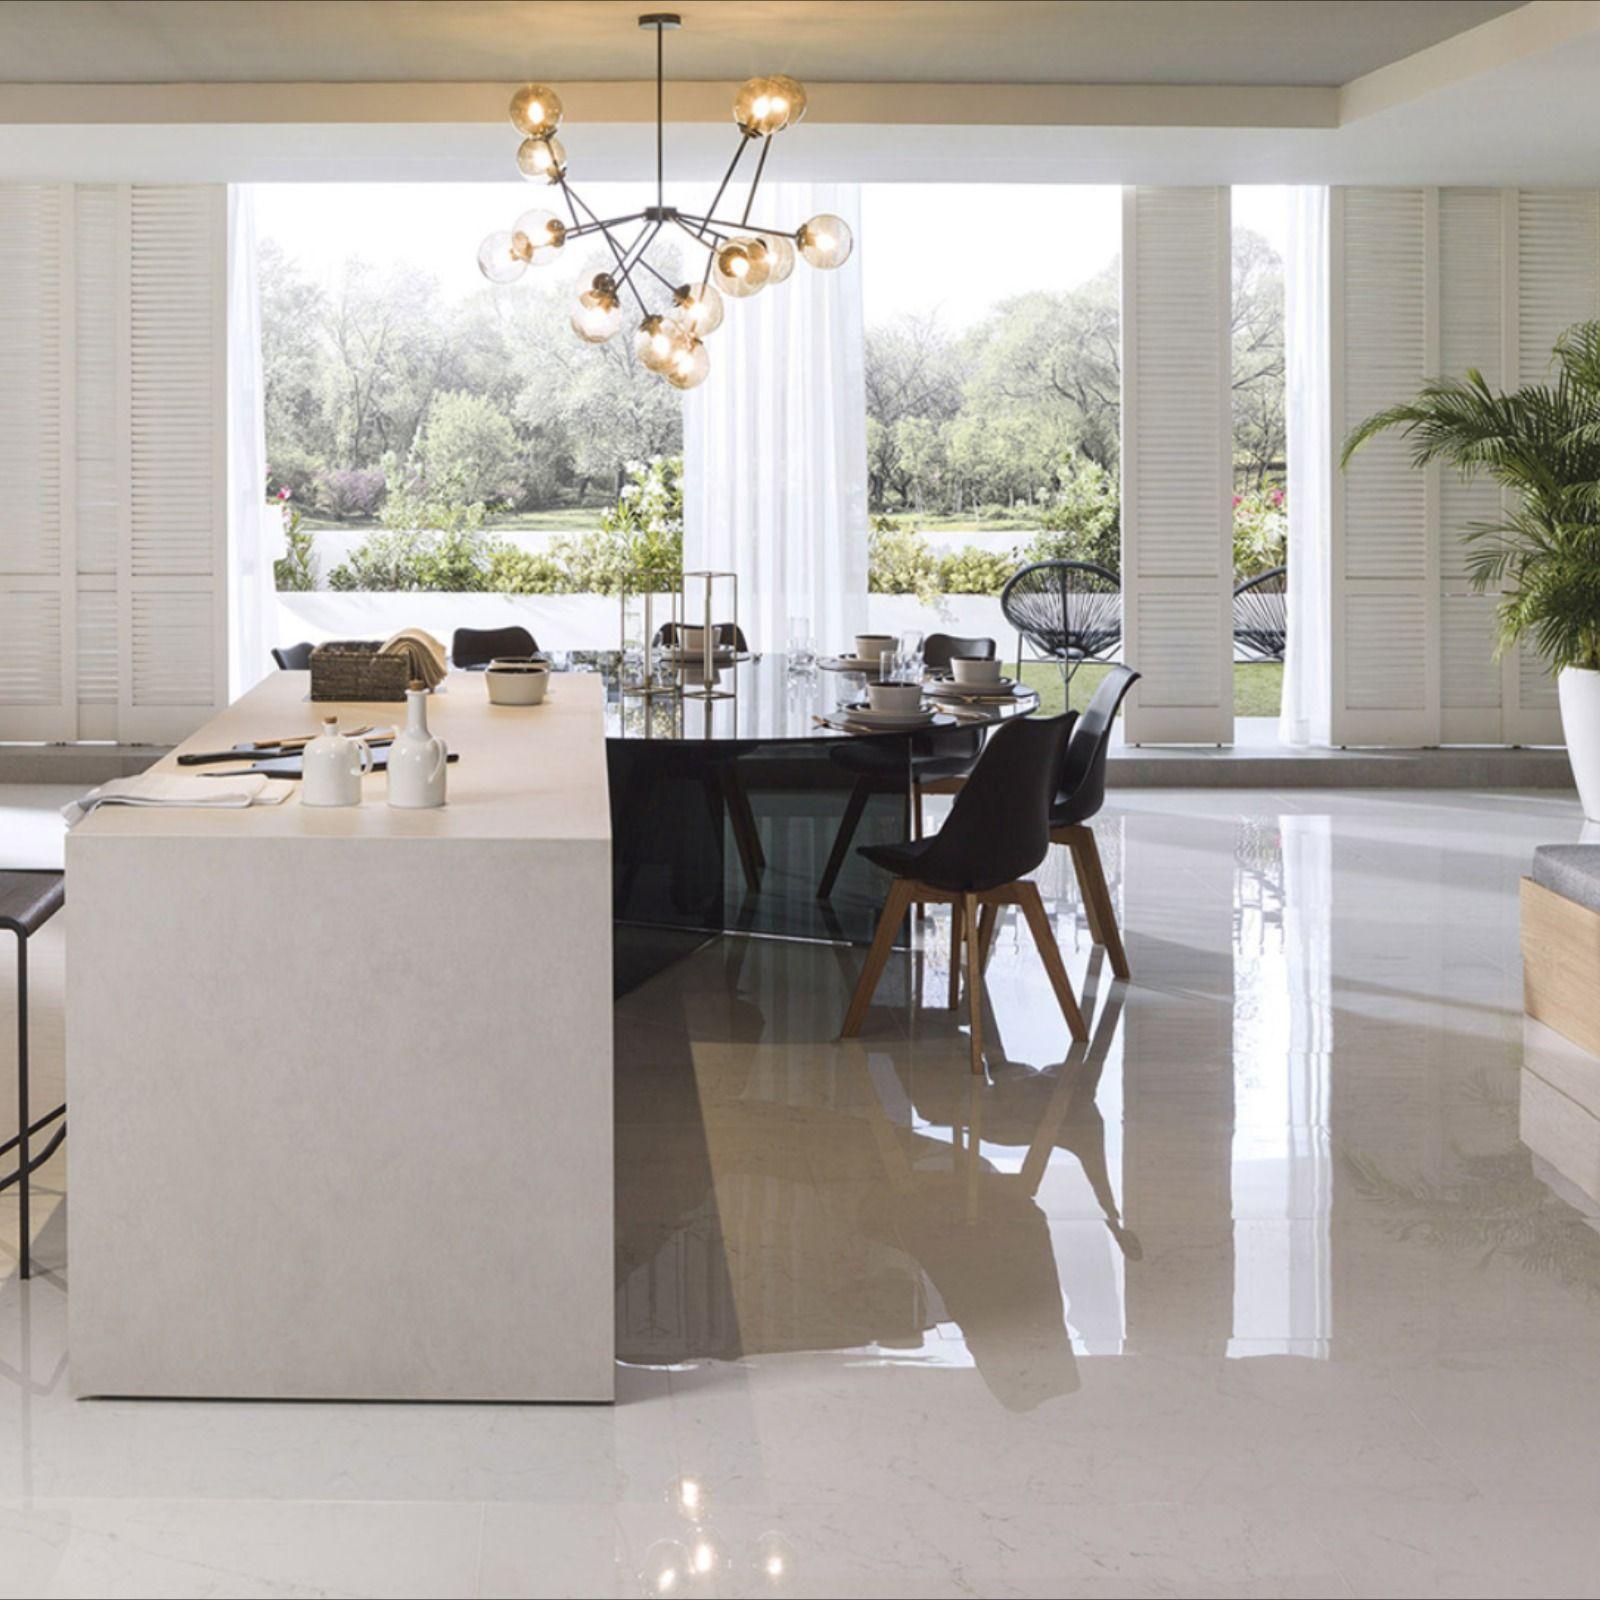 Premium Kitchens With The Porcelanosa Group Seal Kitchen Island With Seating Modern Kitchen Design Rustic Kitchen Backsplash